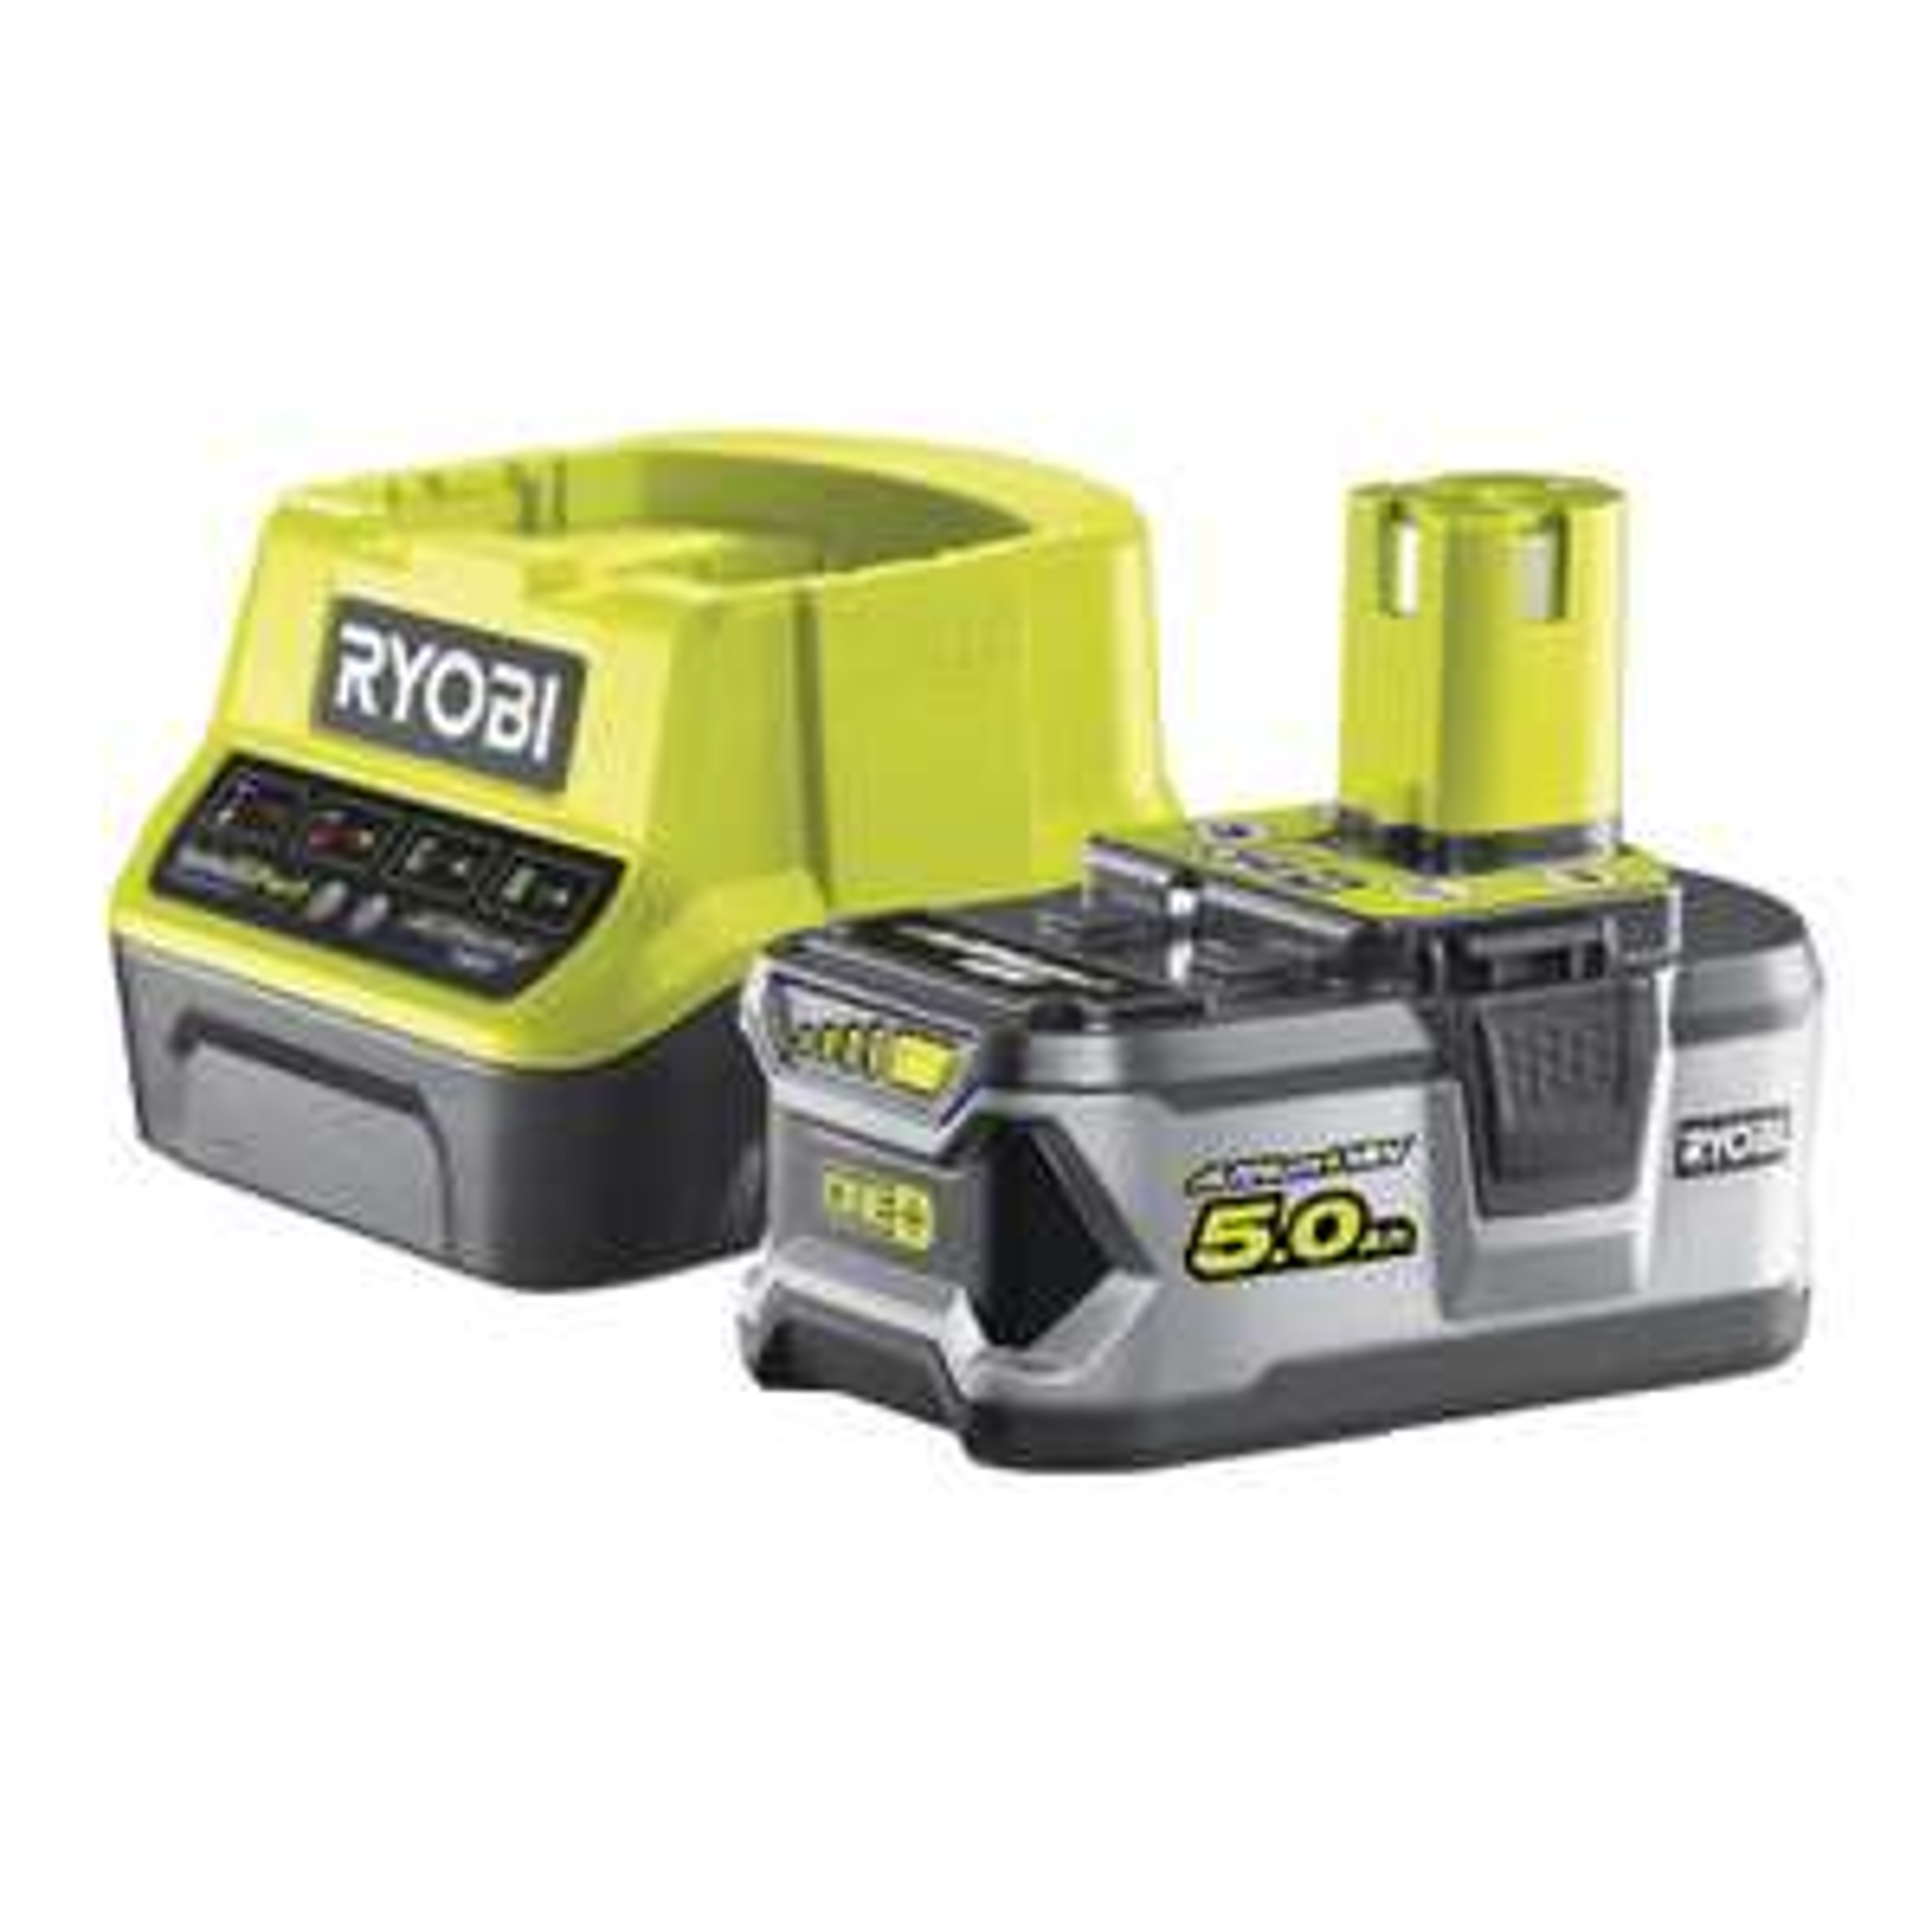 [toom] Ryobi Aktion -20€ auf 18V Akku-Starter-Set ONE+ 'RC18120-150' bei Kauf eines Geräts